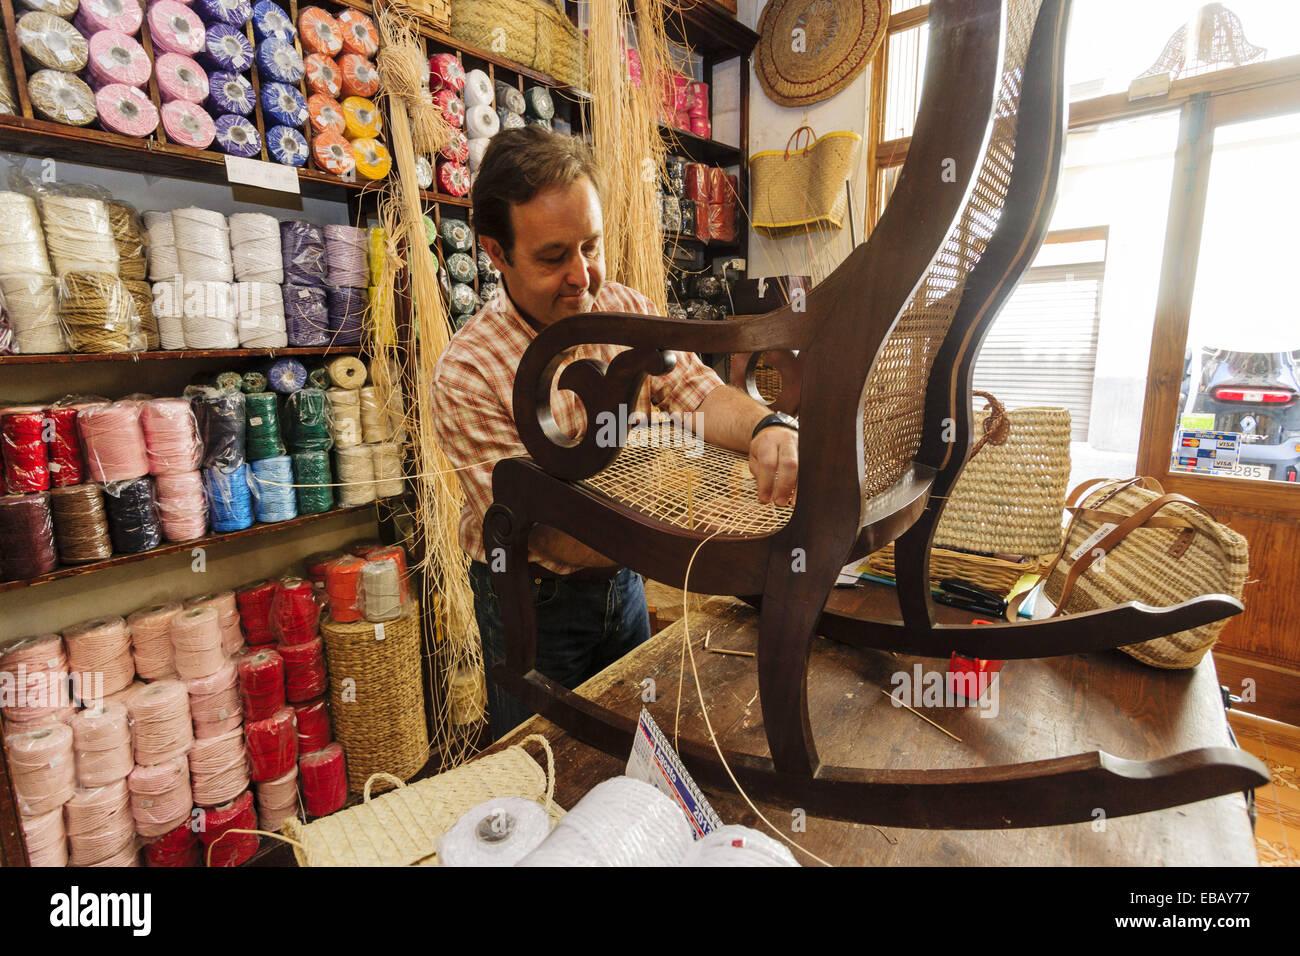 craftsman weaving a wicker rocker, Mimbreria Vidal, Palma, Mallorca, Balearic Islands, spain, europe - Stock Image